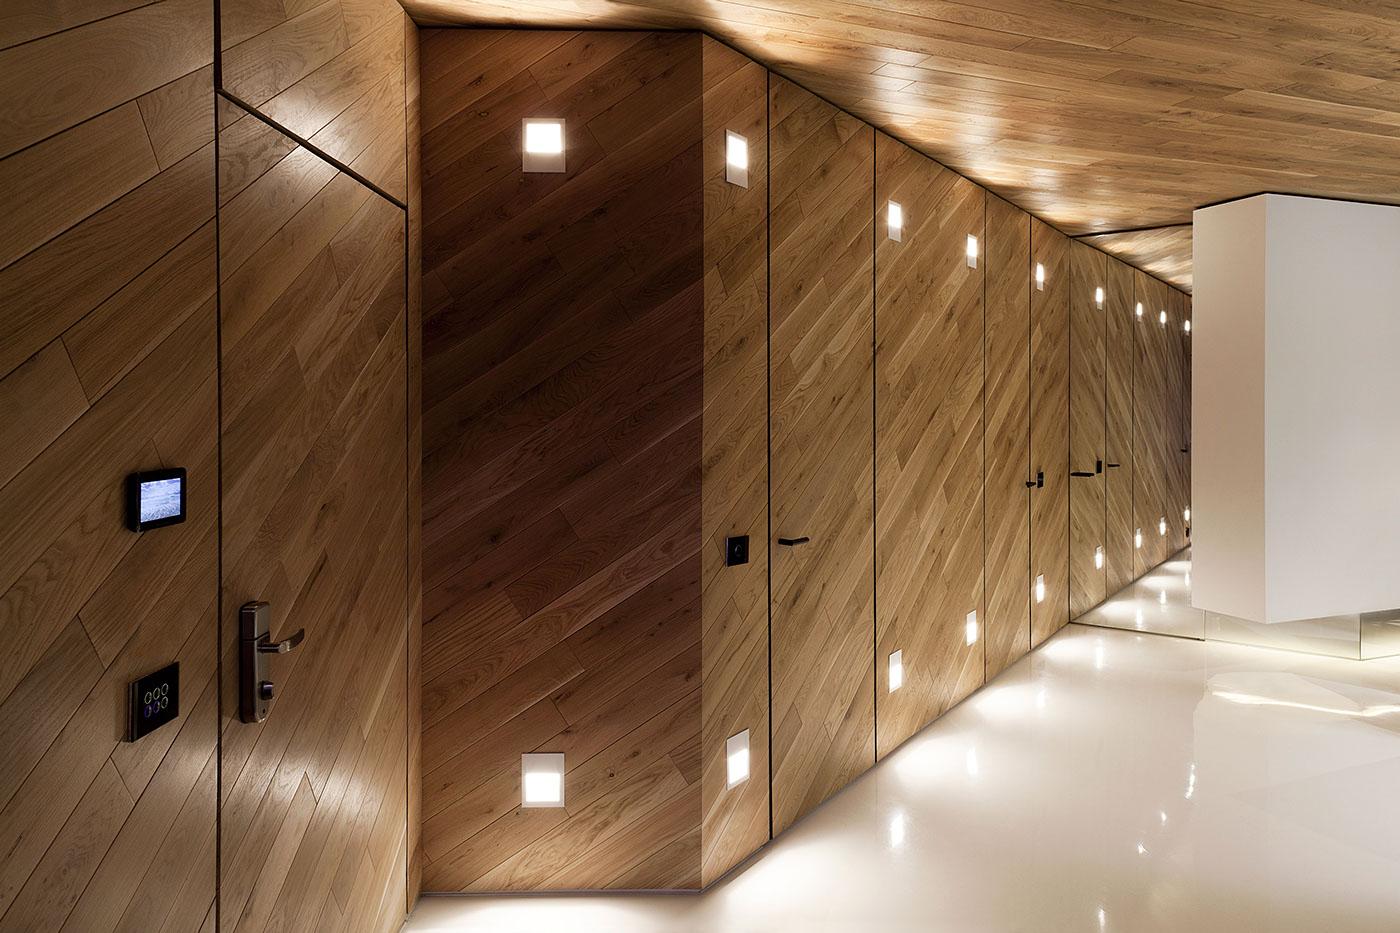 studio mode10 Loft Apartment By Studio Mode